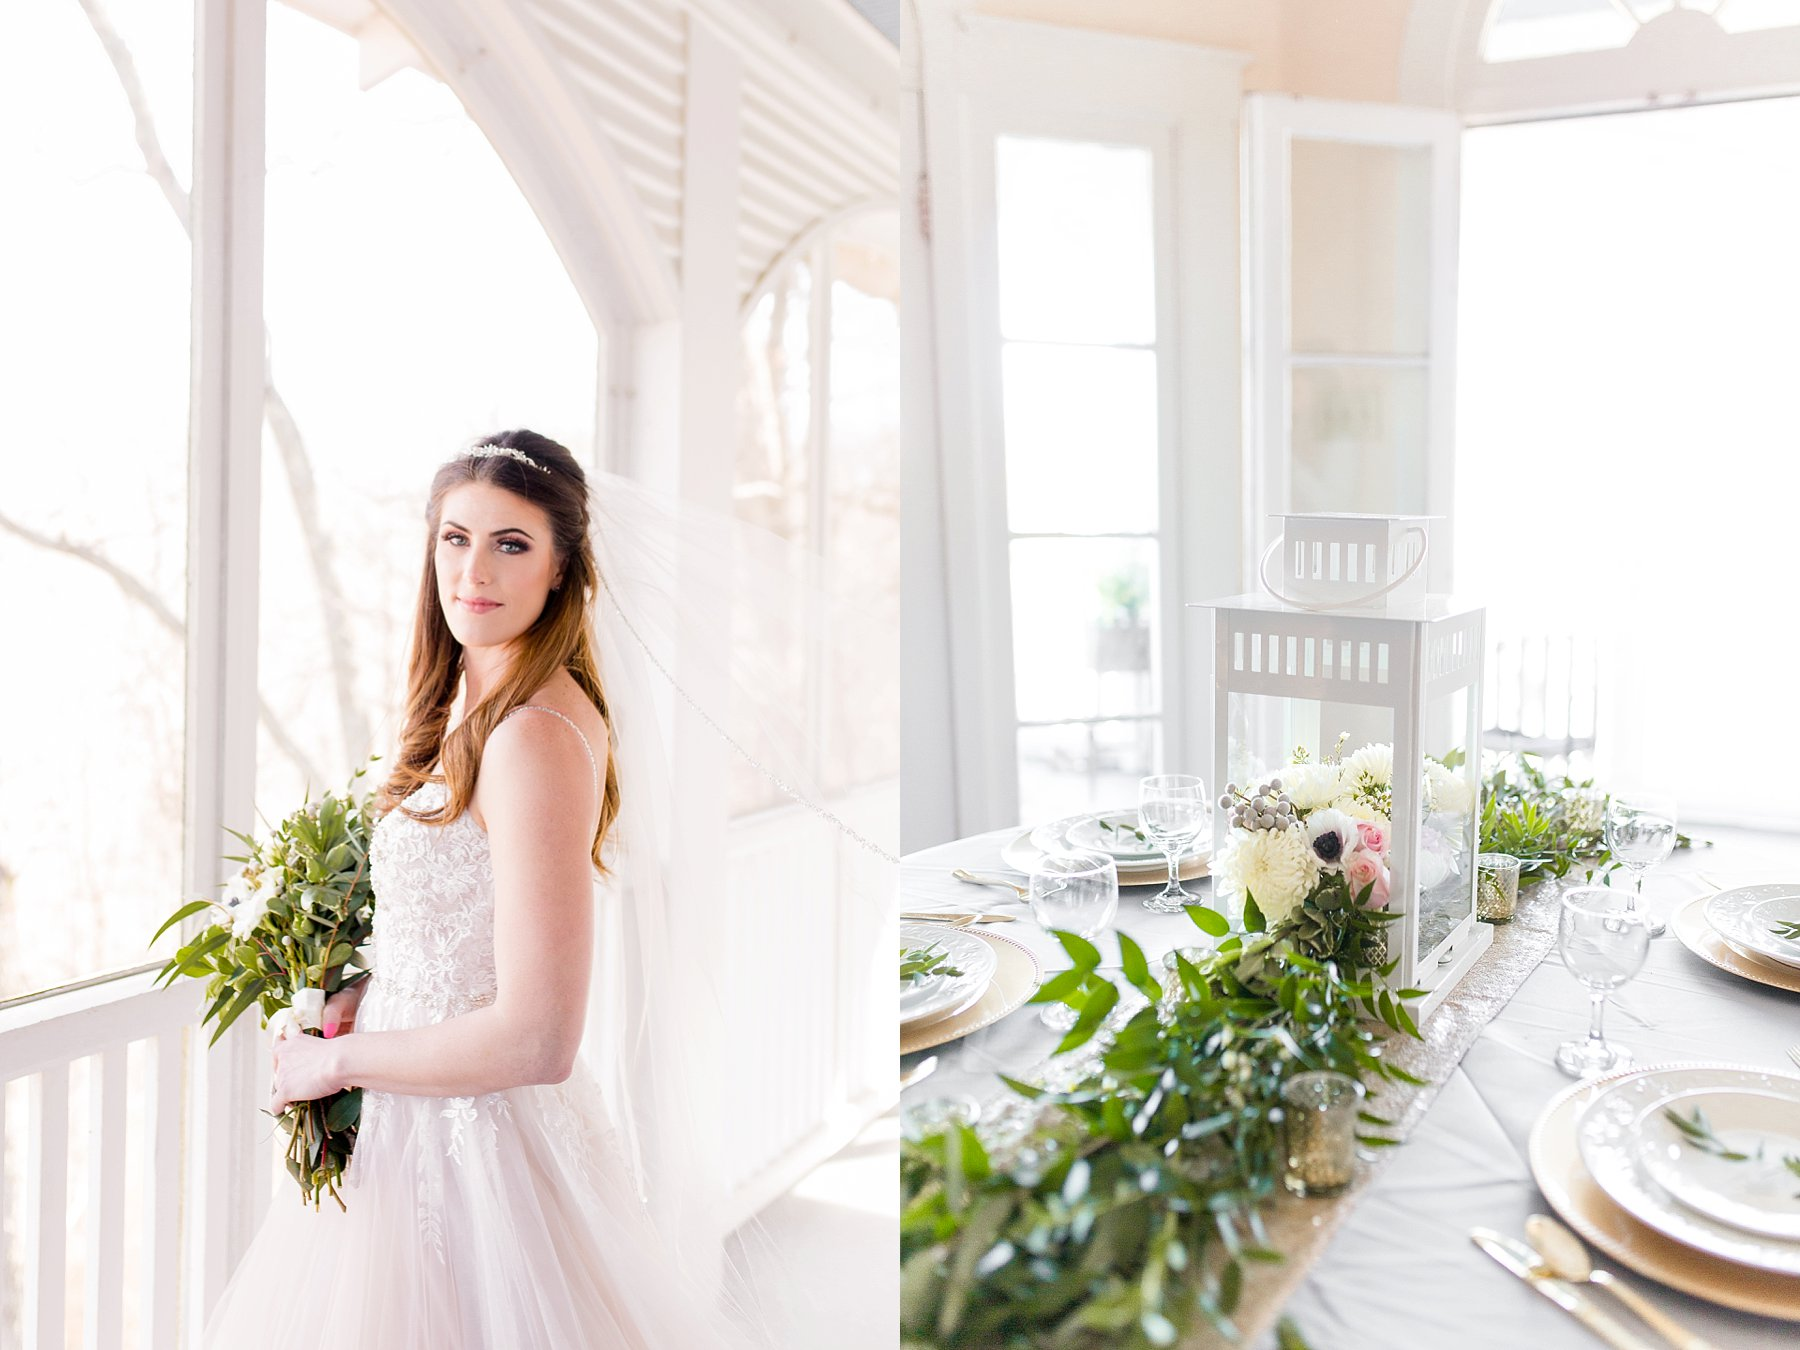 photographer_wedding_saint_louis_Kansas_City_Photography_Videography_workshop_training_styled_engagement_Lake_Ozark_KC_MO_STL_Rolla_Hermann_Saint_James_0434.jpg